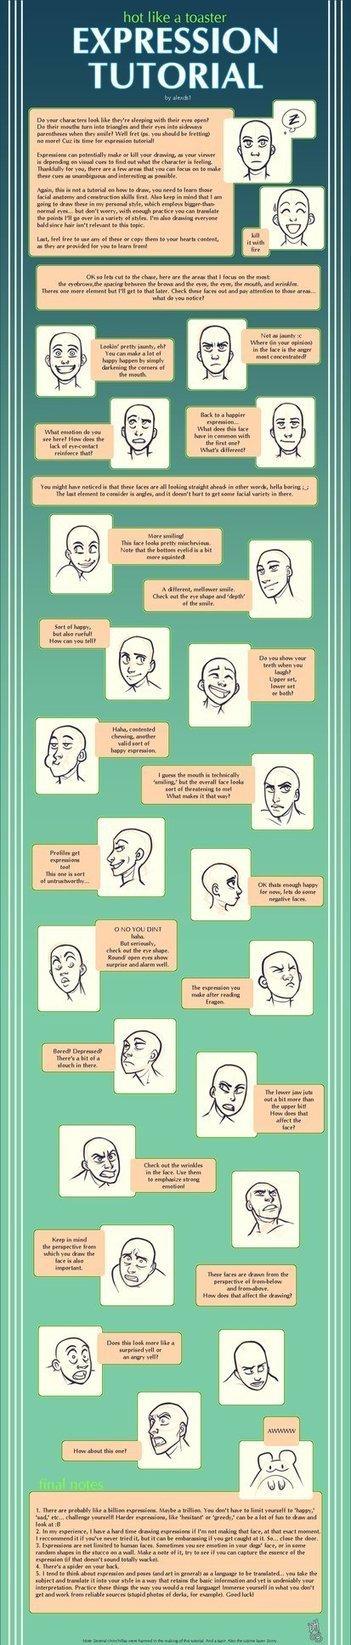 Expression tutorial | Ecologia da mente | Scoop.it